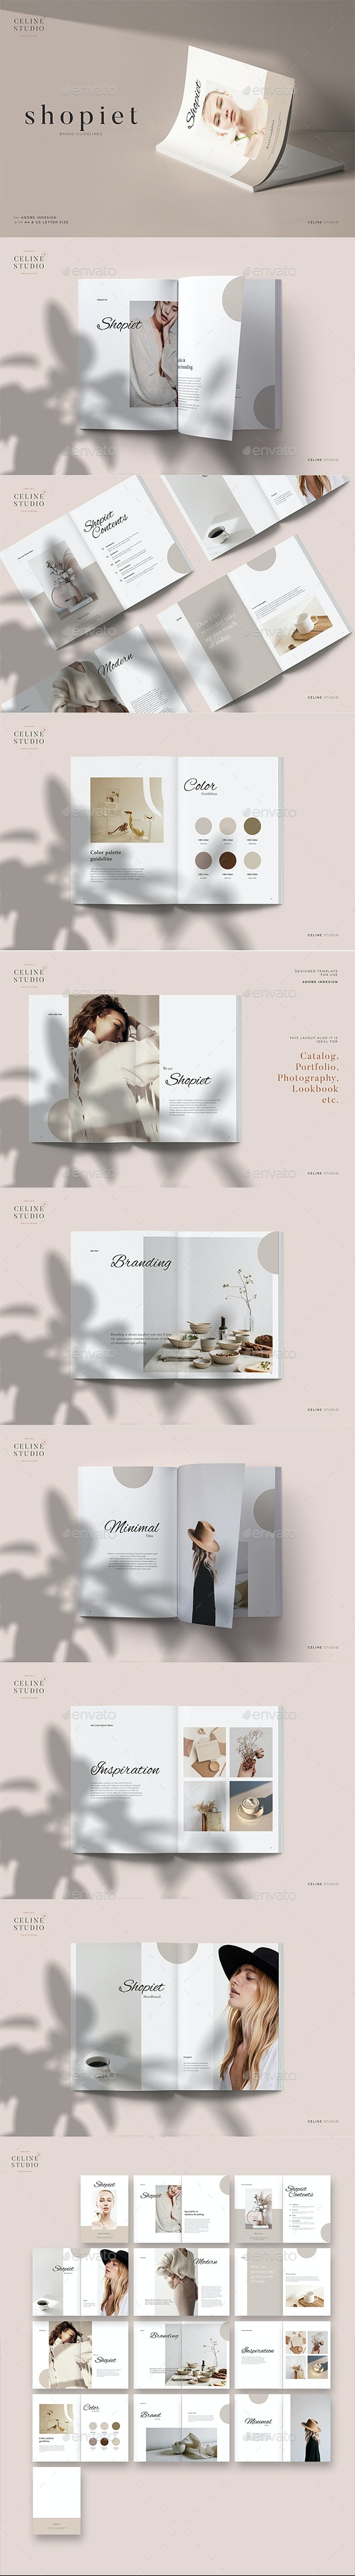 Shopiet - Brand Guidelines - Magazines Print Templates